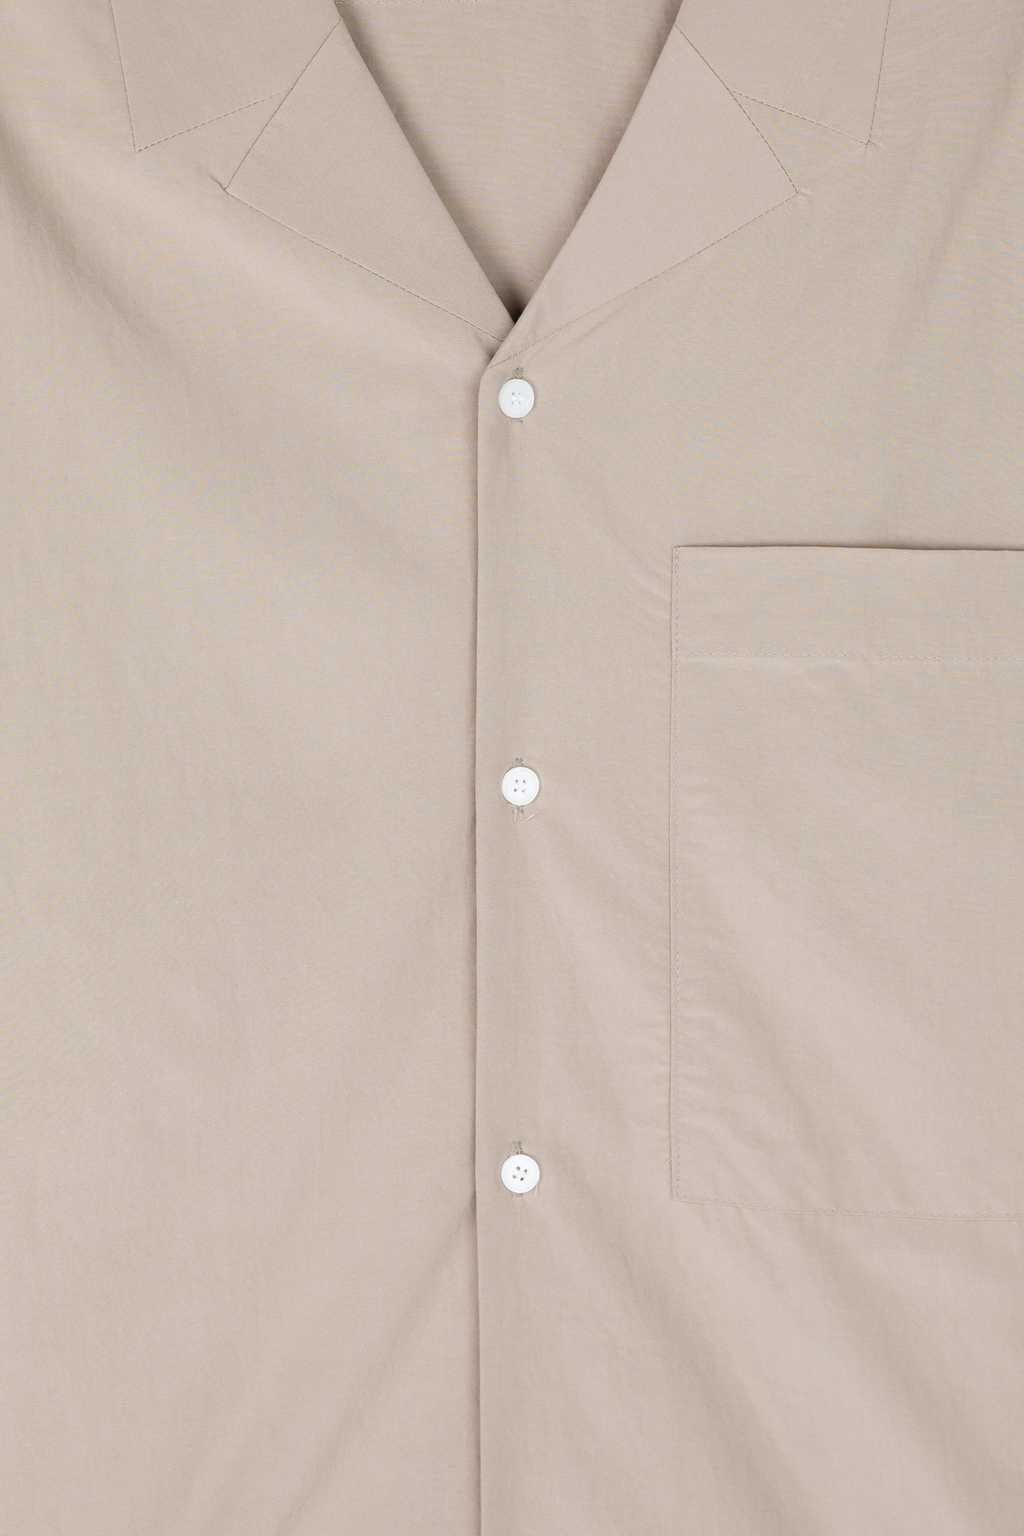 Shirt K008 Beige 6